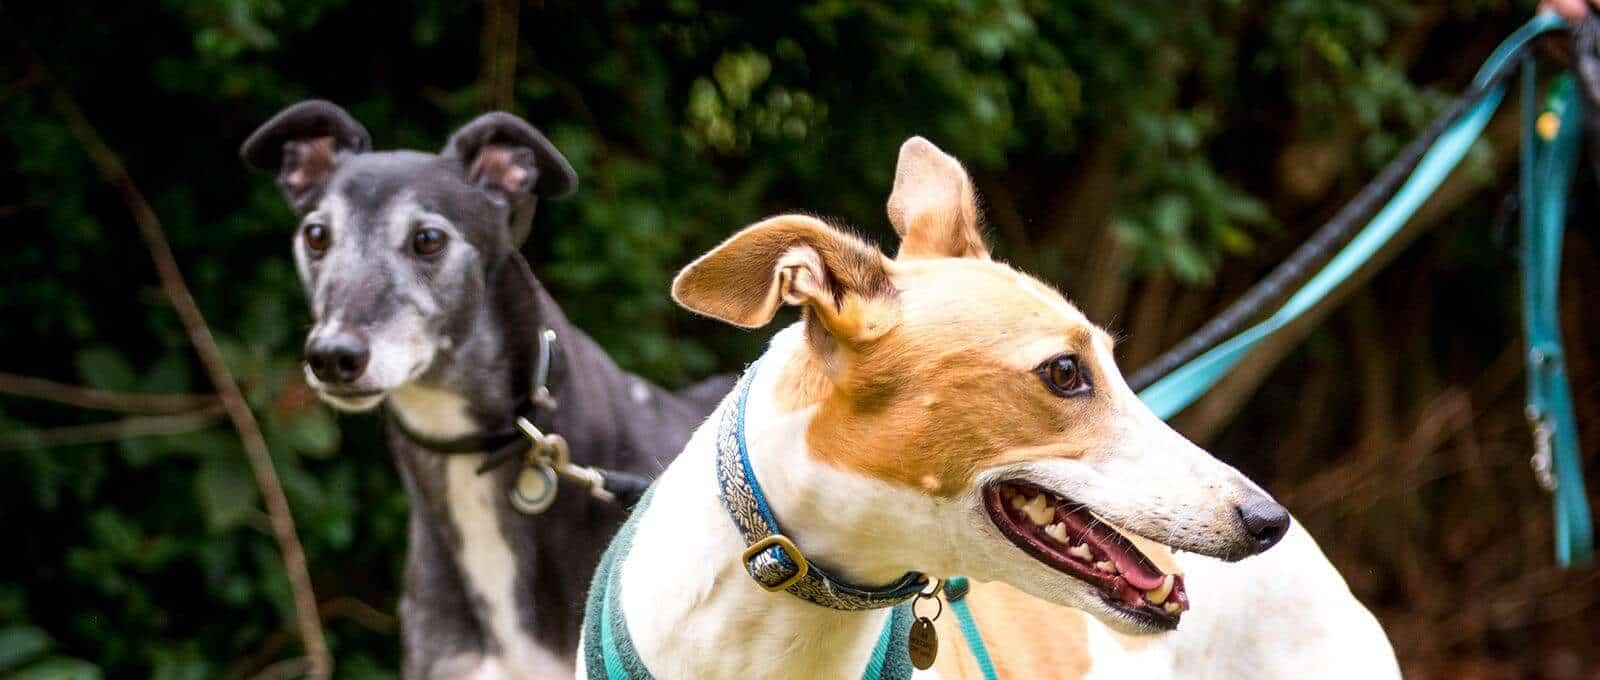 Canine Pawtonomy: What We Do